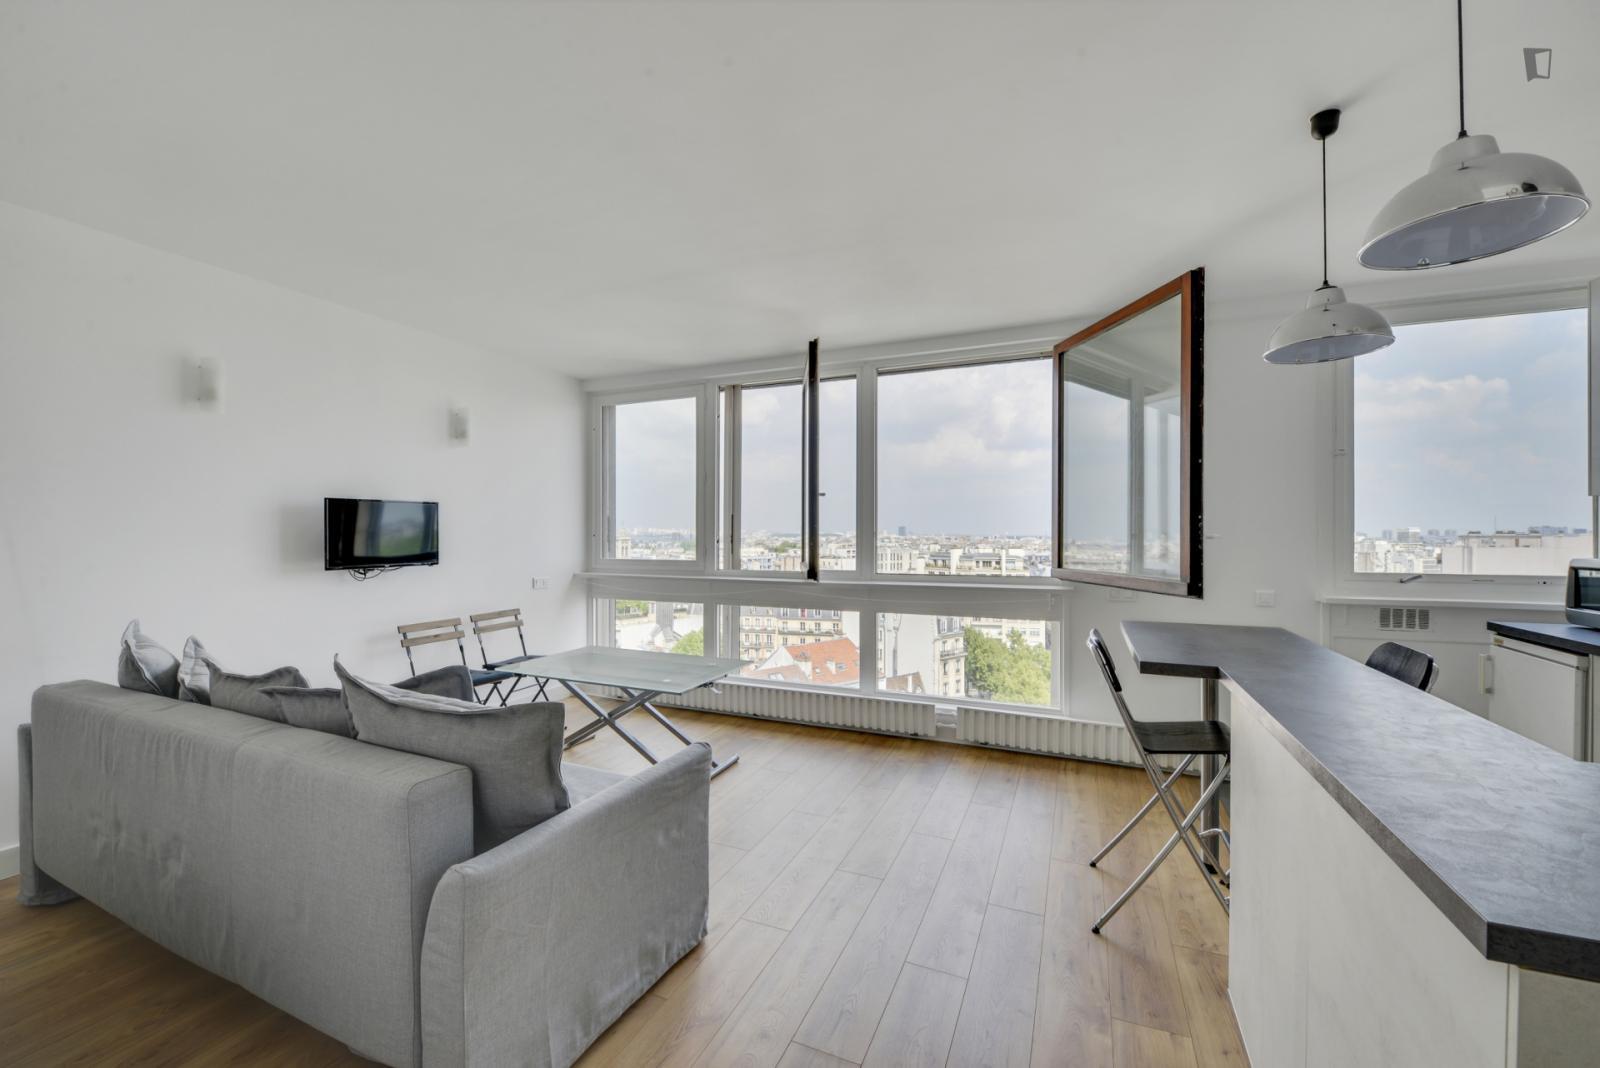 29 Boulevard Edgar Quinet, 14th arrondissement of Paris, FR-75 - 1,350 EUR/ month